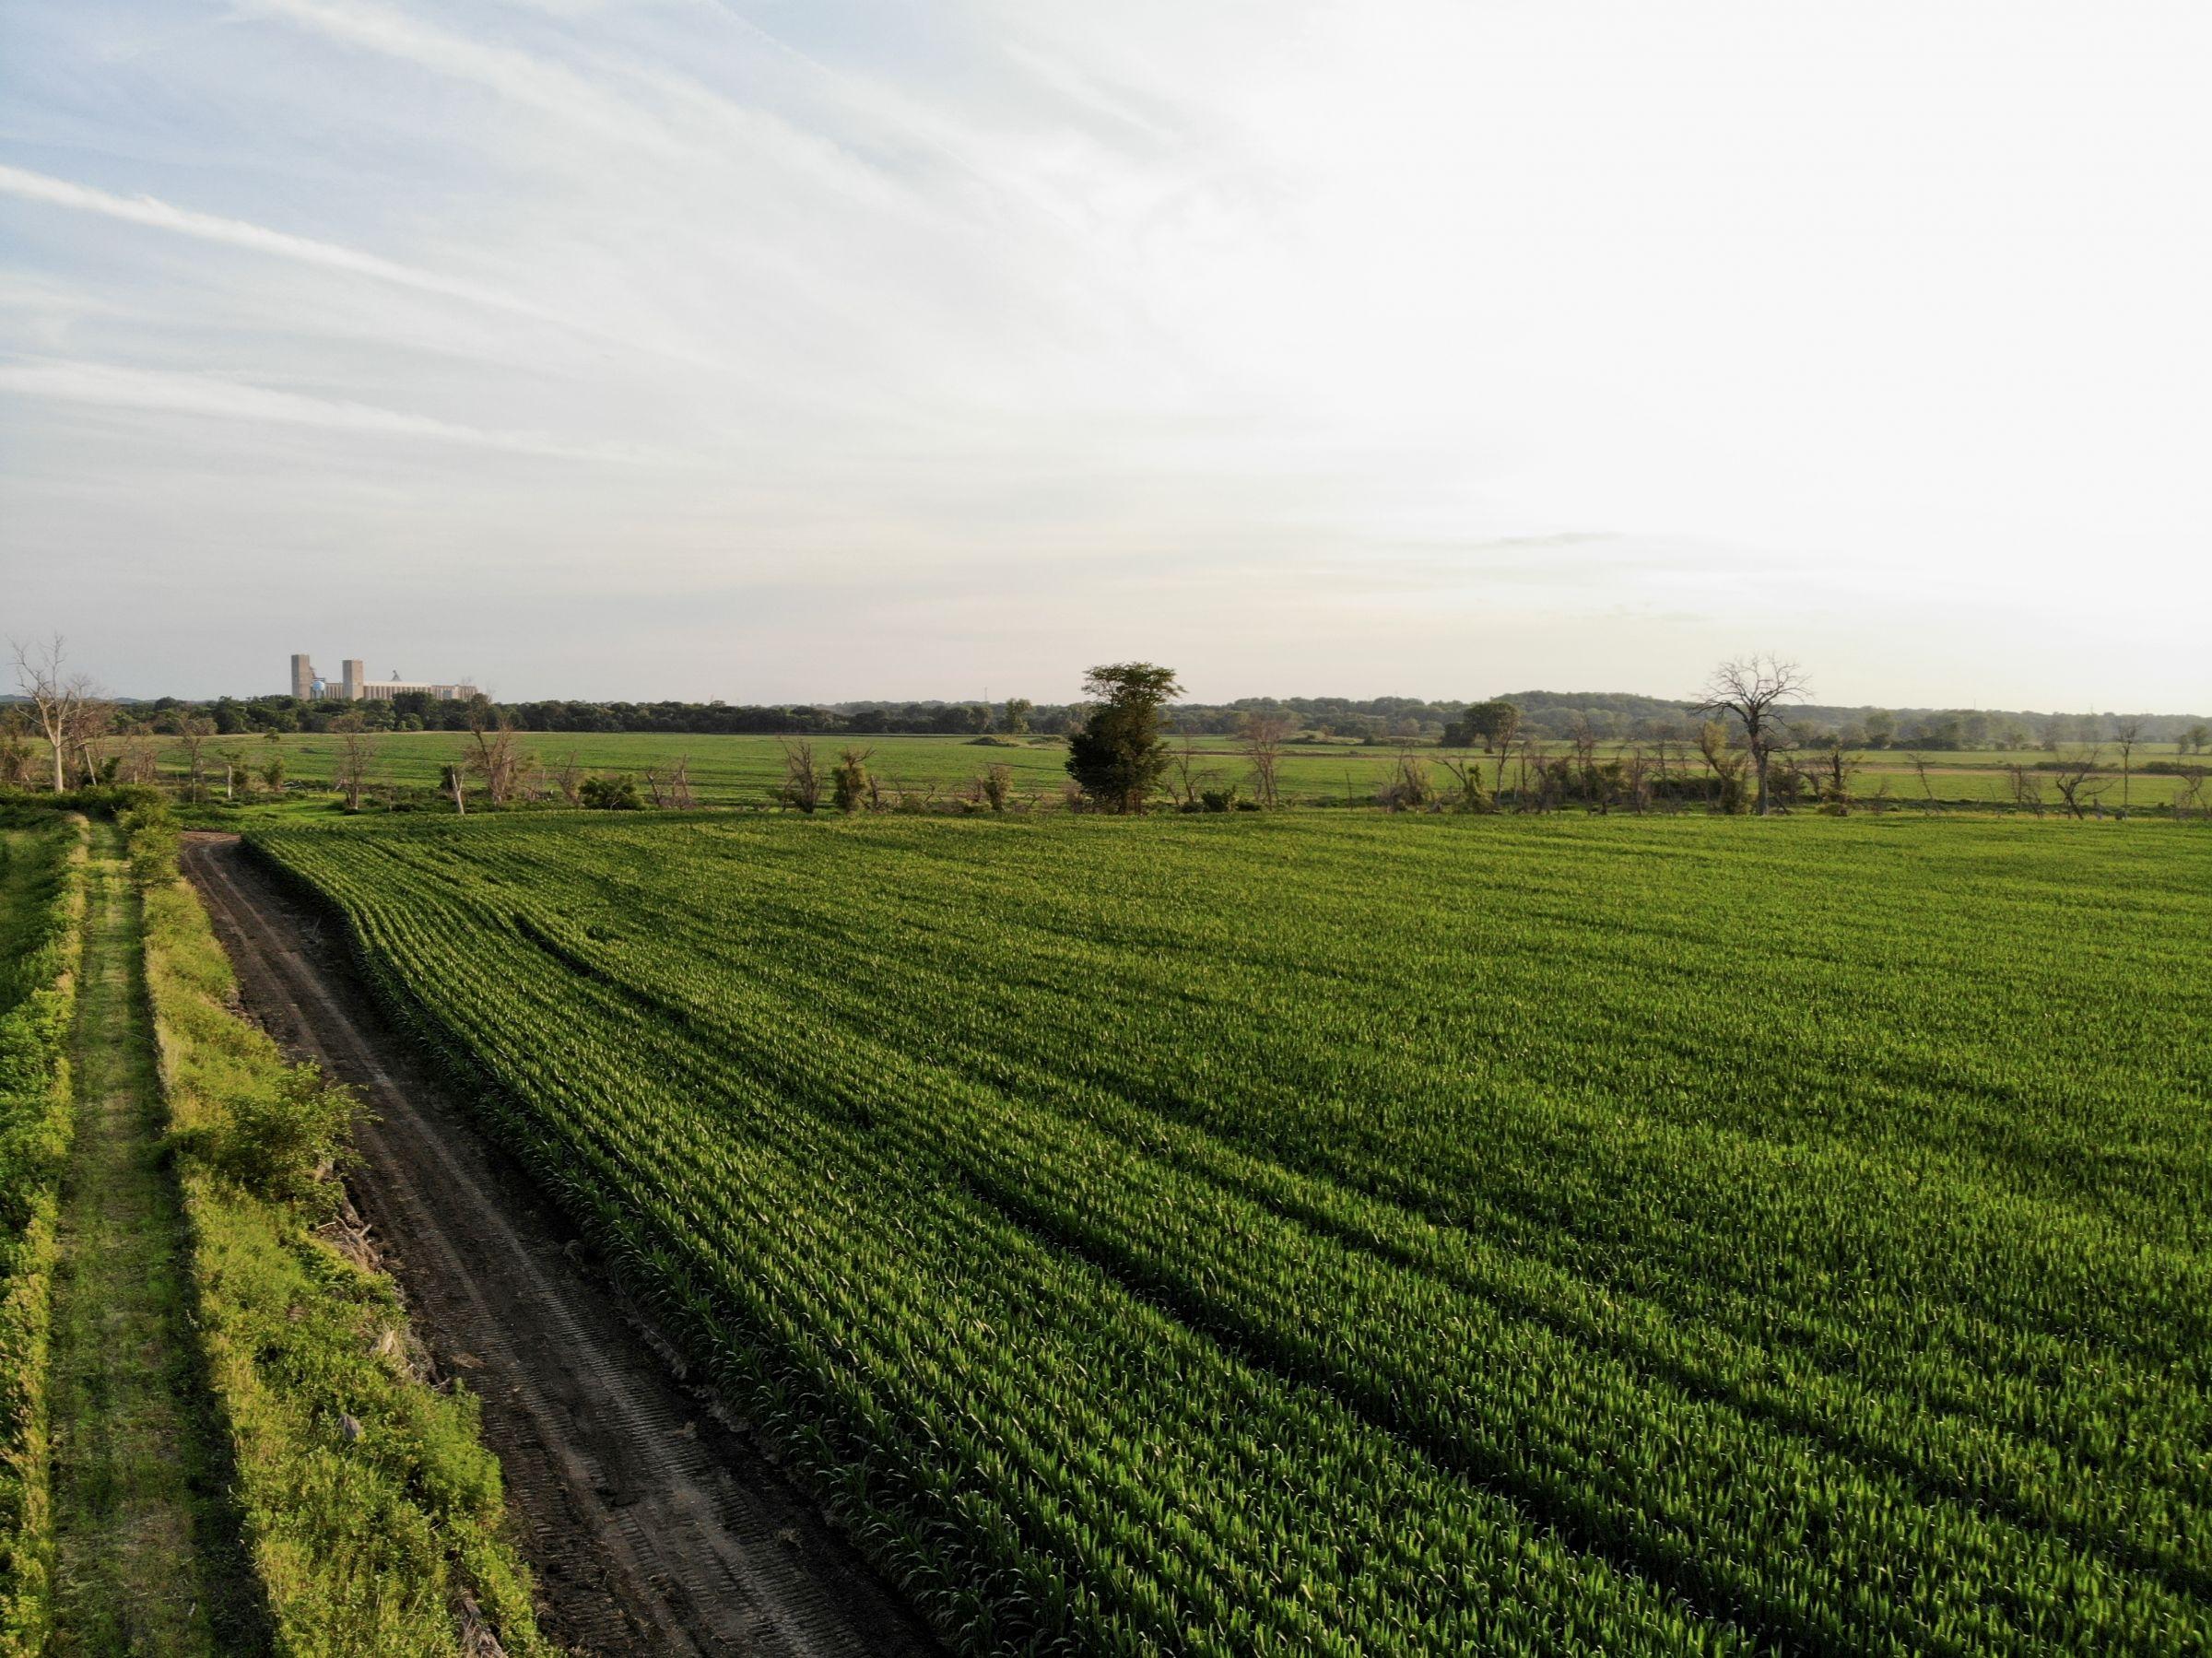 land-polk-county-iowa-202-acres-listing-number-15625-1-2021-07-09-140043.jpg